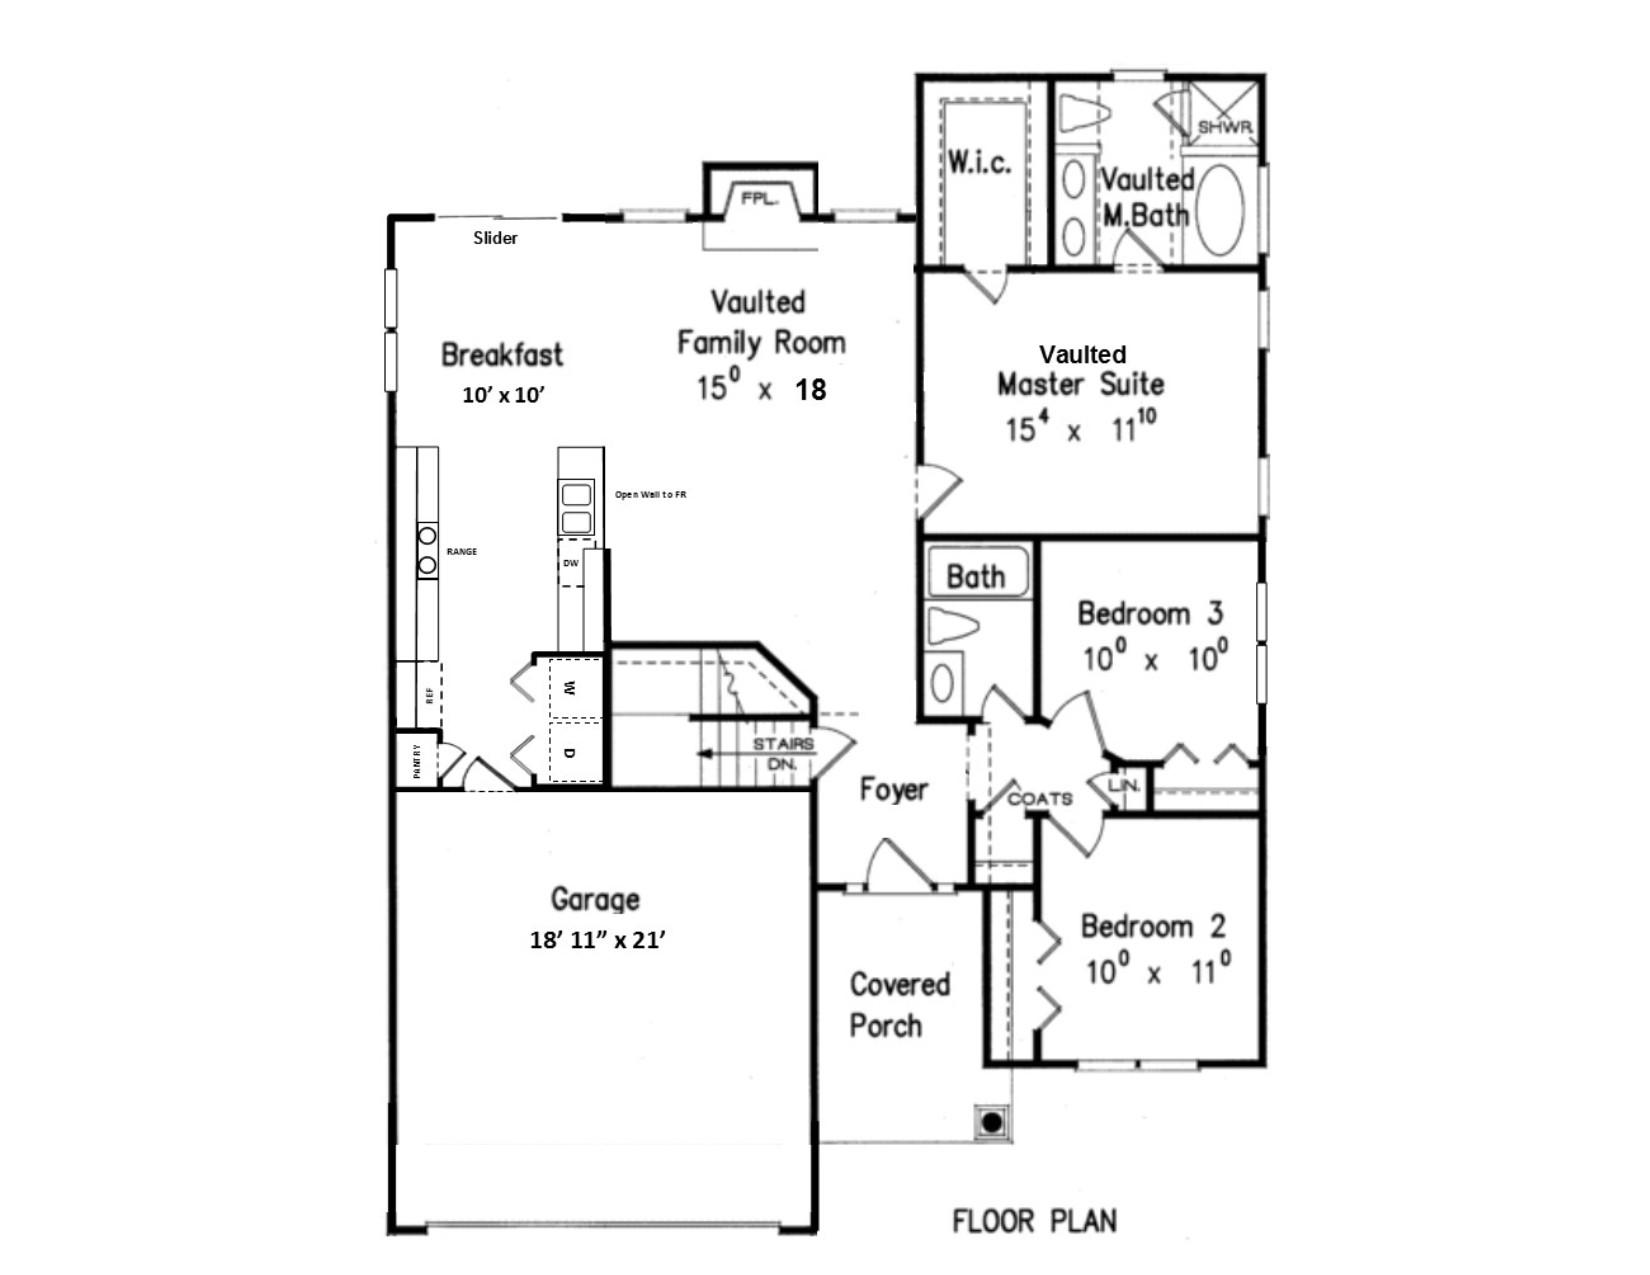 Home Design Archives - BuiltRite Homes on blueprints for houses with open floor plans, mansion plans, i house architecture, i house home, home design floor plans, home builders floor plans, roof plans, split level home floor plans,